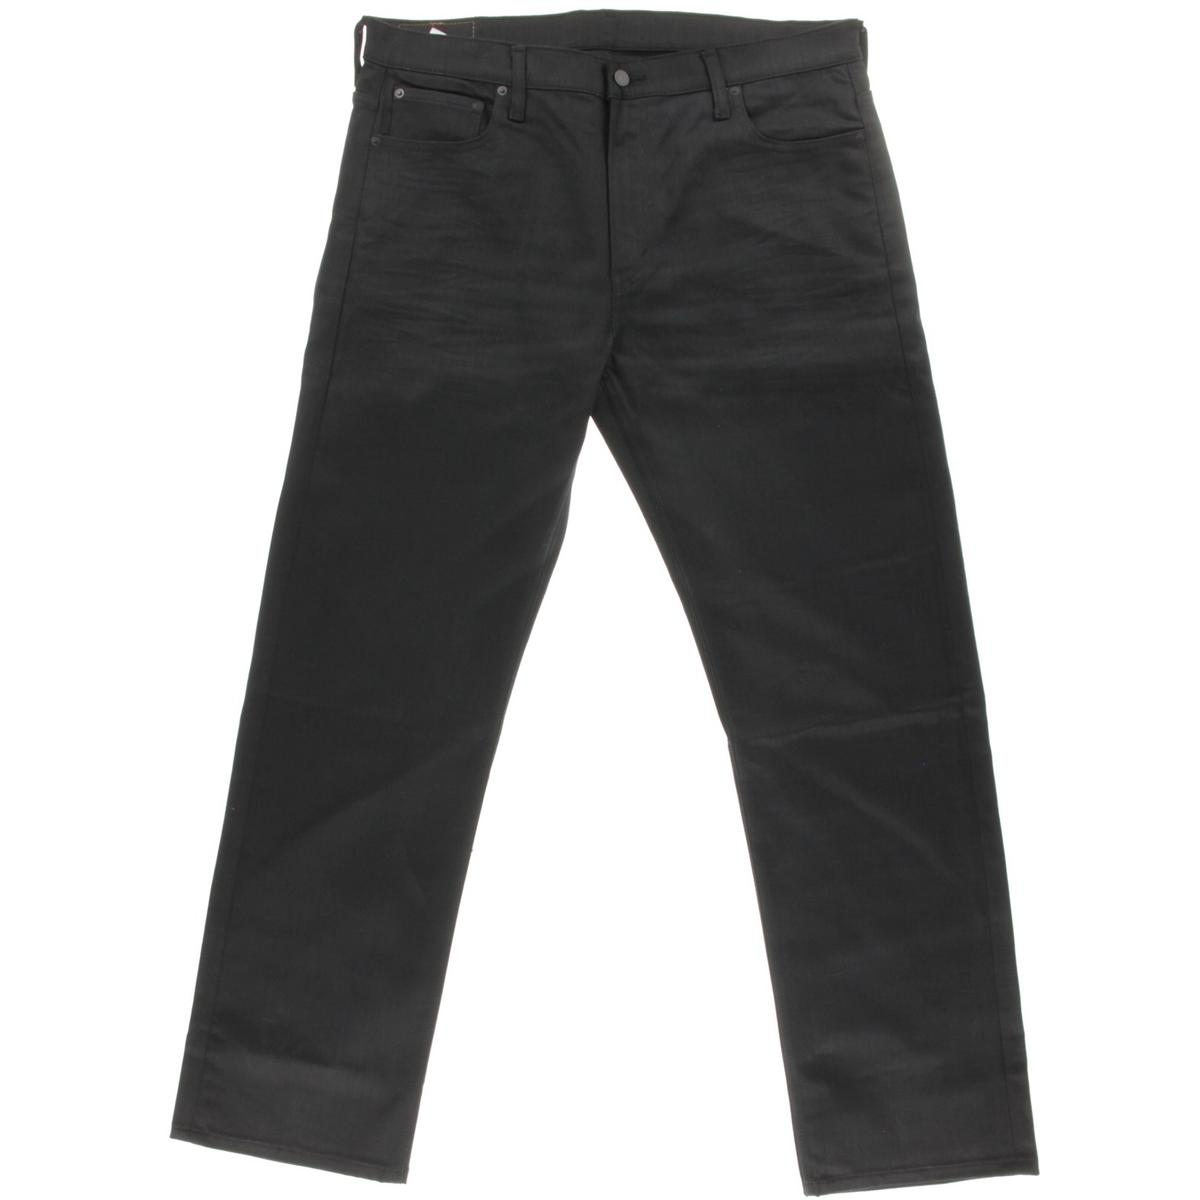 Levi's Mens Loose Fit Classic Straight Leg Jeans